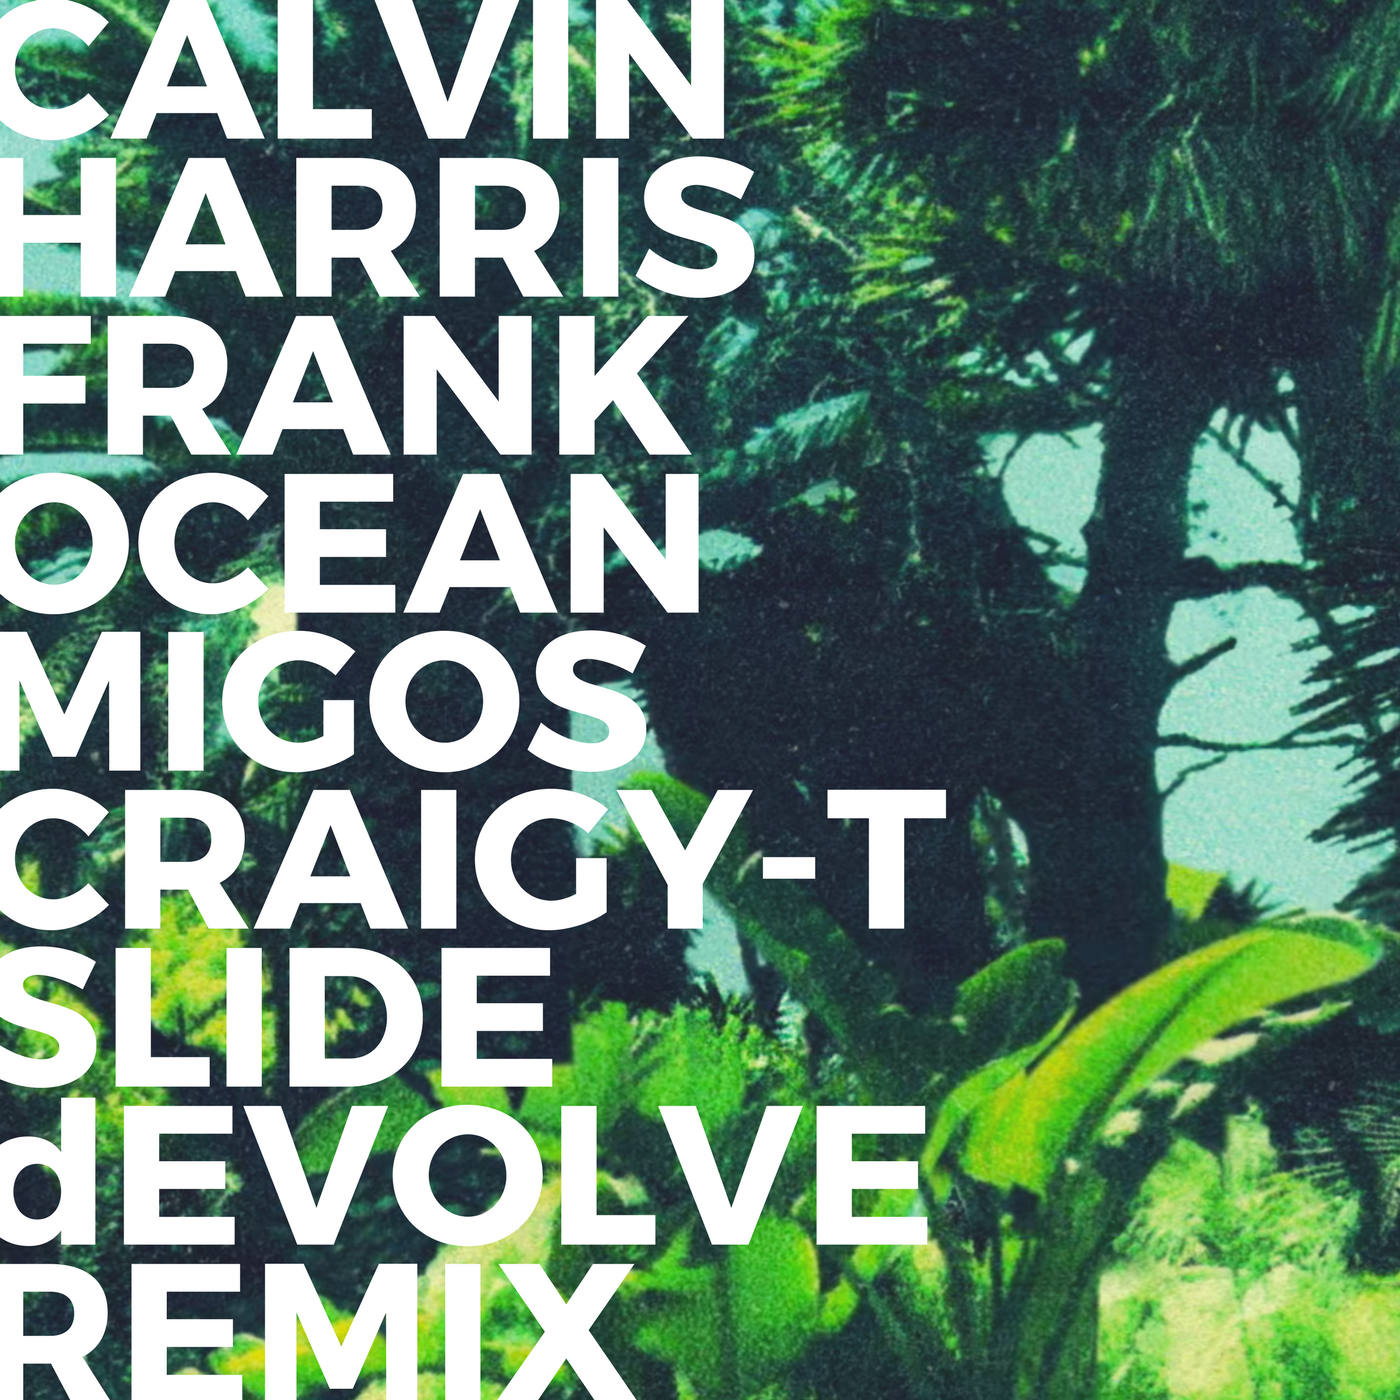 Calvin Harris - Slide (dEVOLVE Remix).png